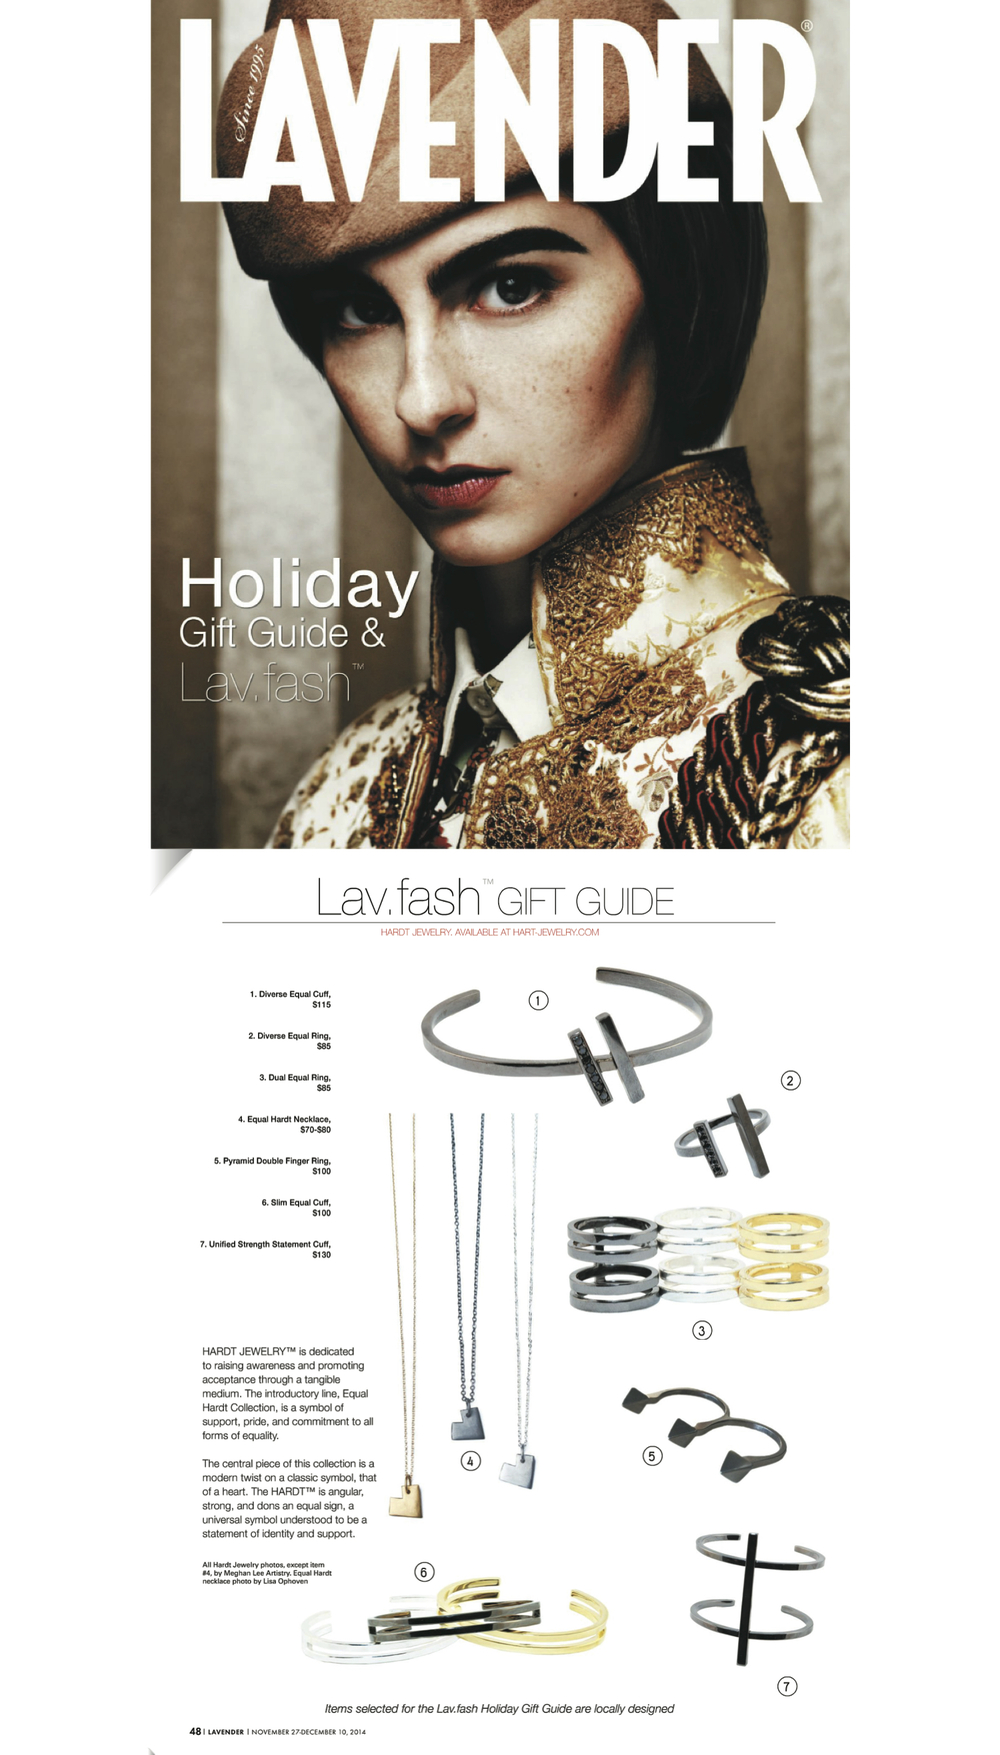 Lavender Magazine - Hardt Jewely - Nov. 2014